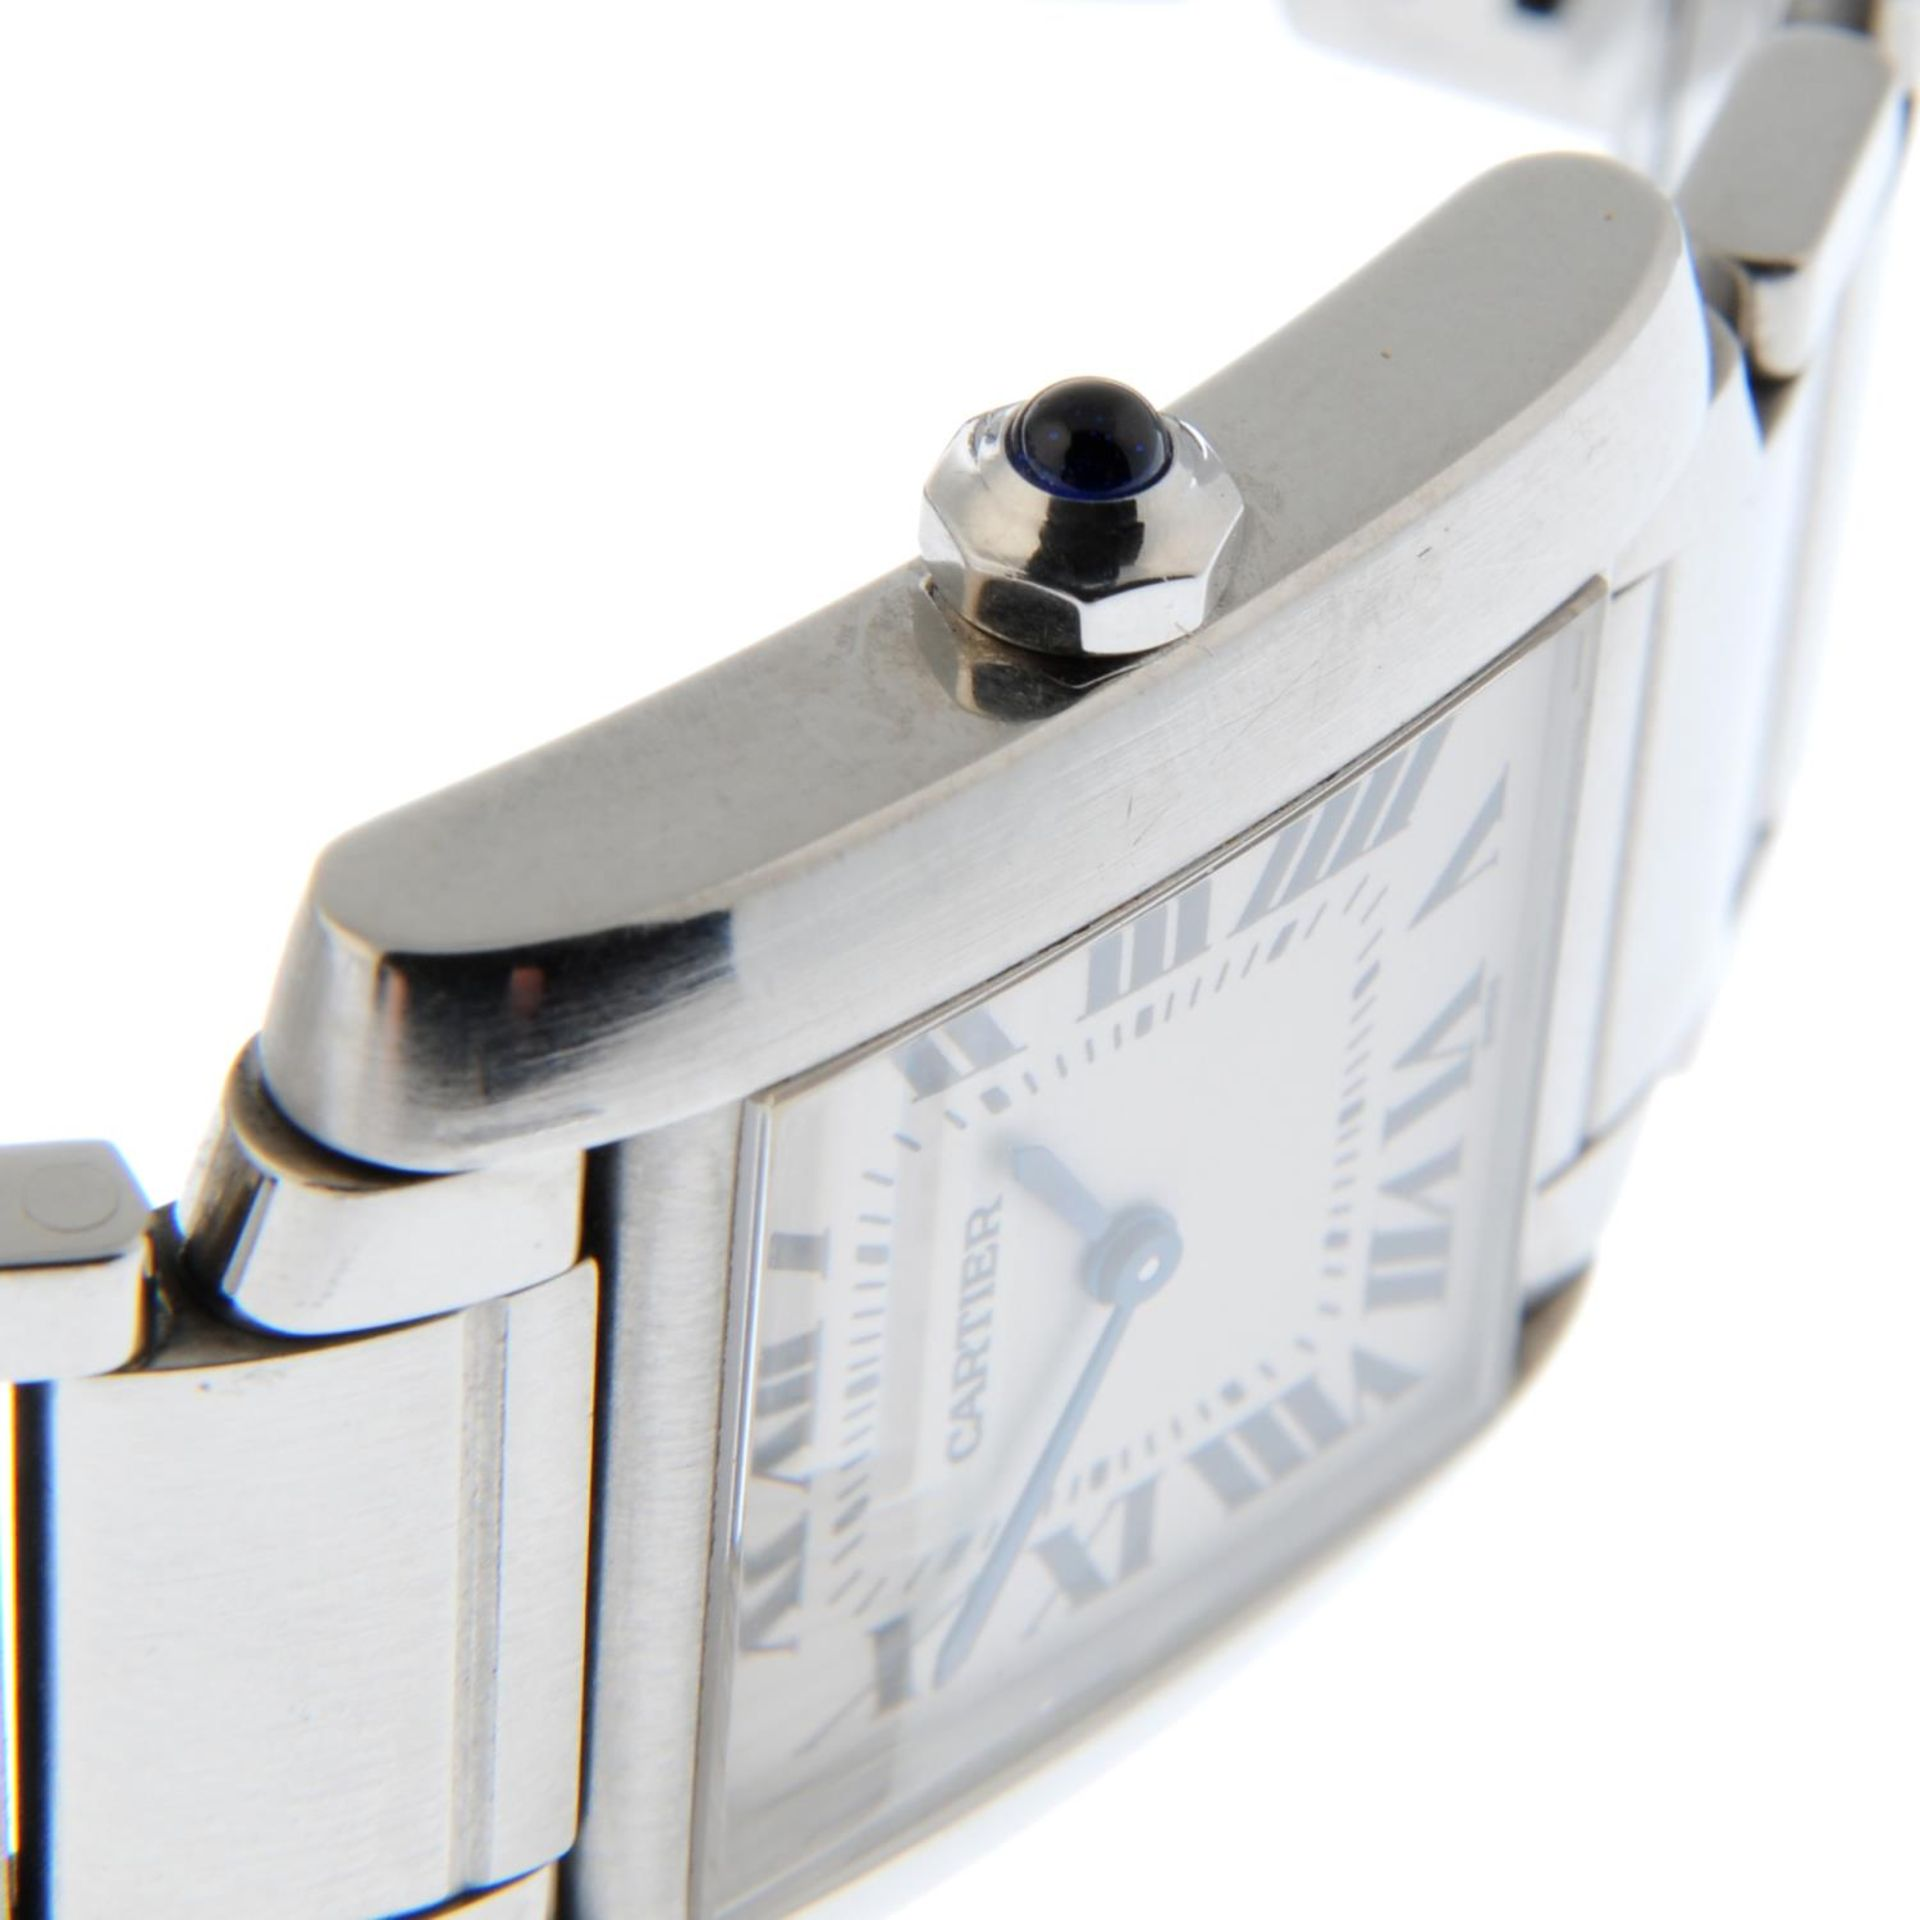 CARTIER - a Tank Francaise bracelet watch. - Bild 5 aus 5